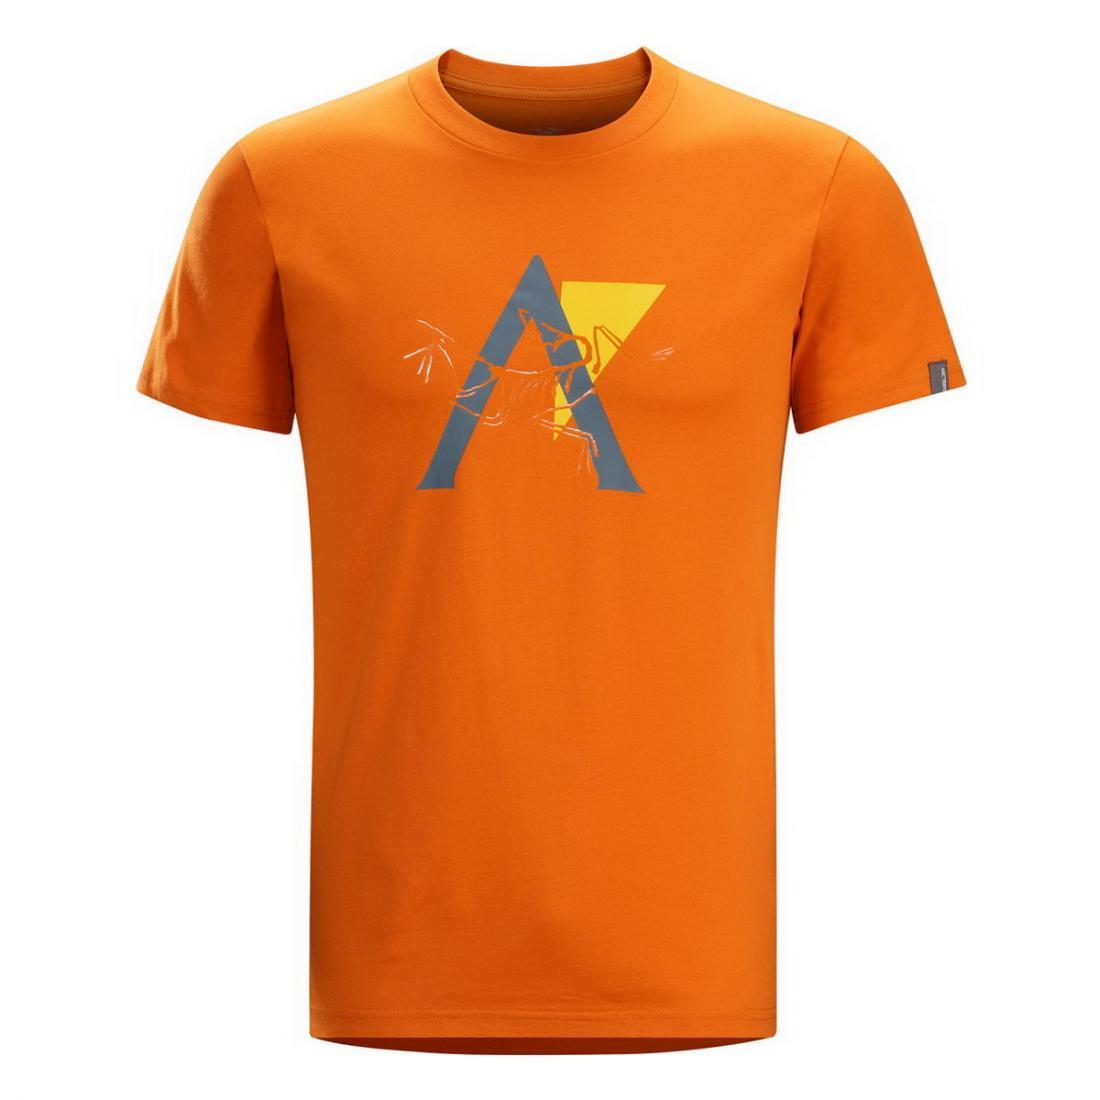 Футболка Stack SS T-Shirt муж.Футболки, поло<br><br><br>Цвет: Оранжевый<br>Размер: XL